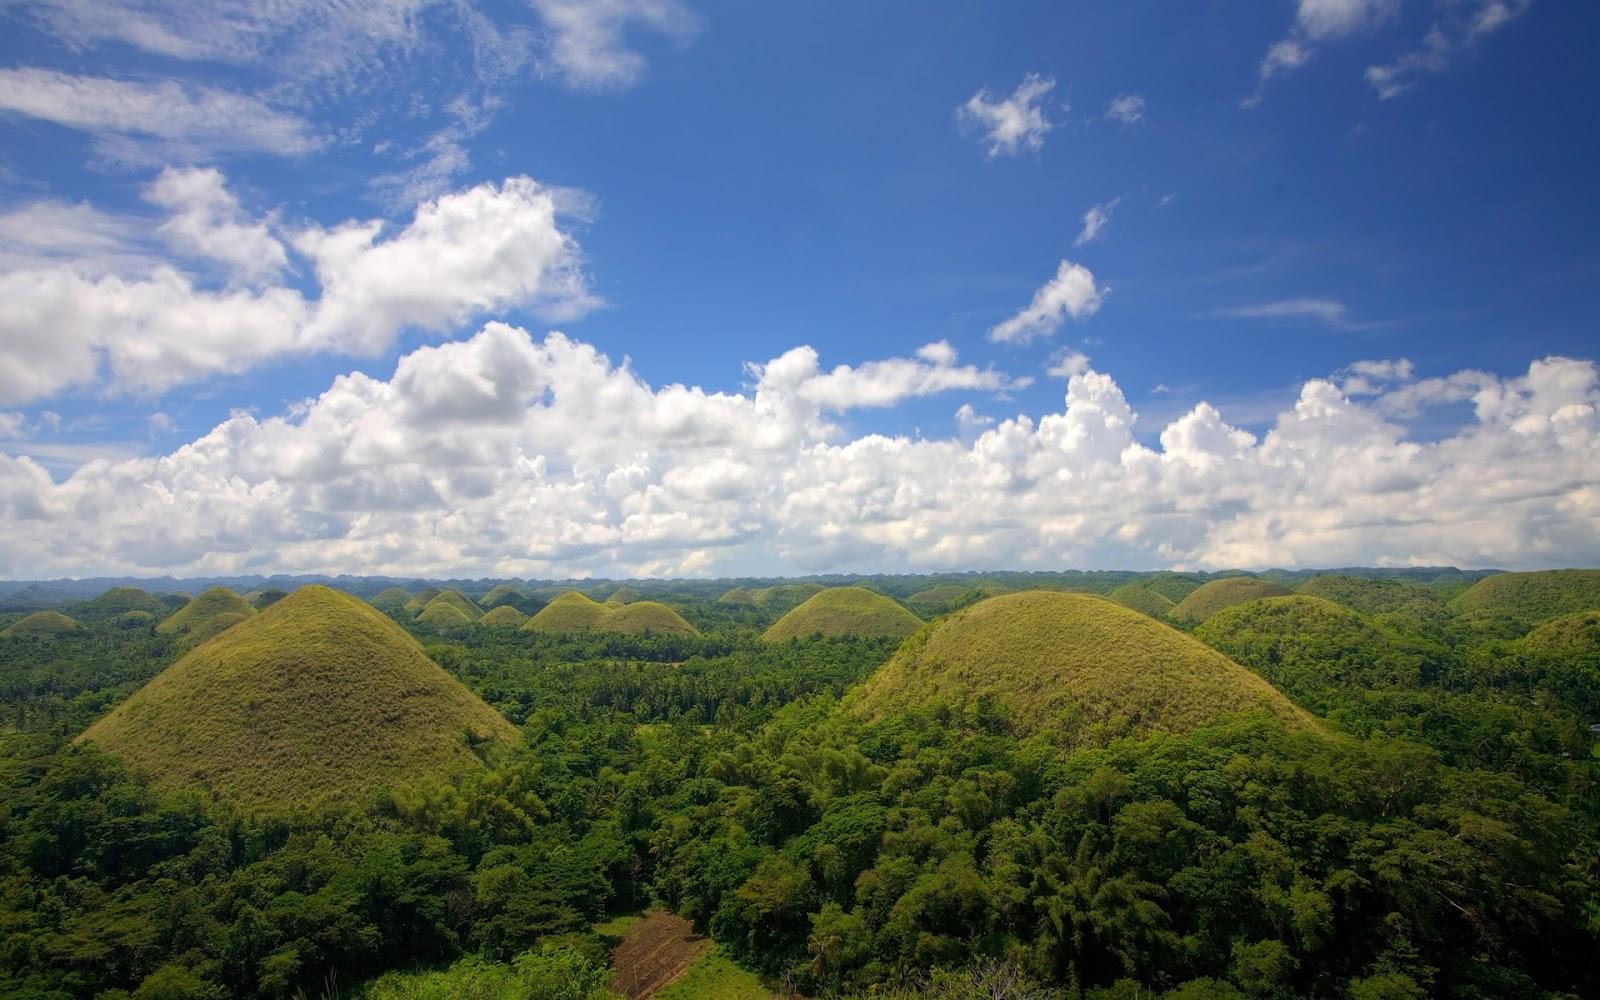 http://3.bp.blogspot.com/-0HRix3J1gBg/Tz6DDFXi3rI/AAAAAAAADOU/J4GiqOTlQdk/s1600/Chocolate+Hills,+Bohol+island,+Philippines.jpg